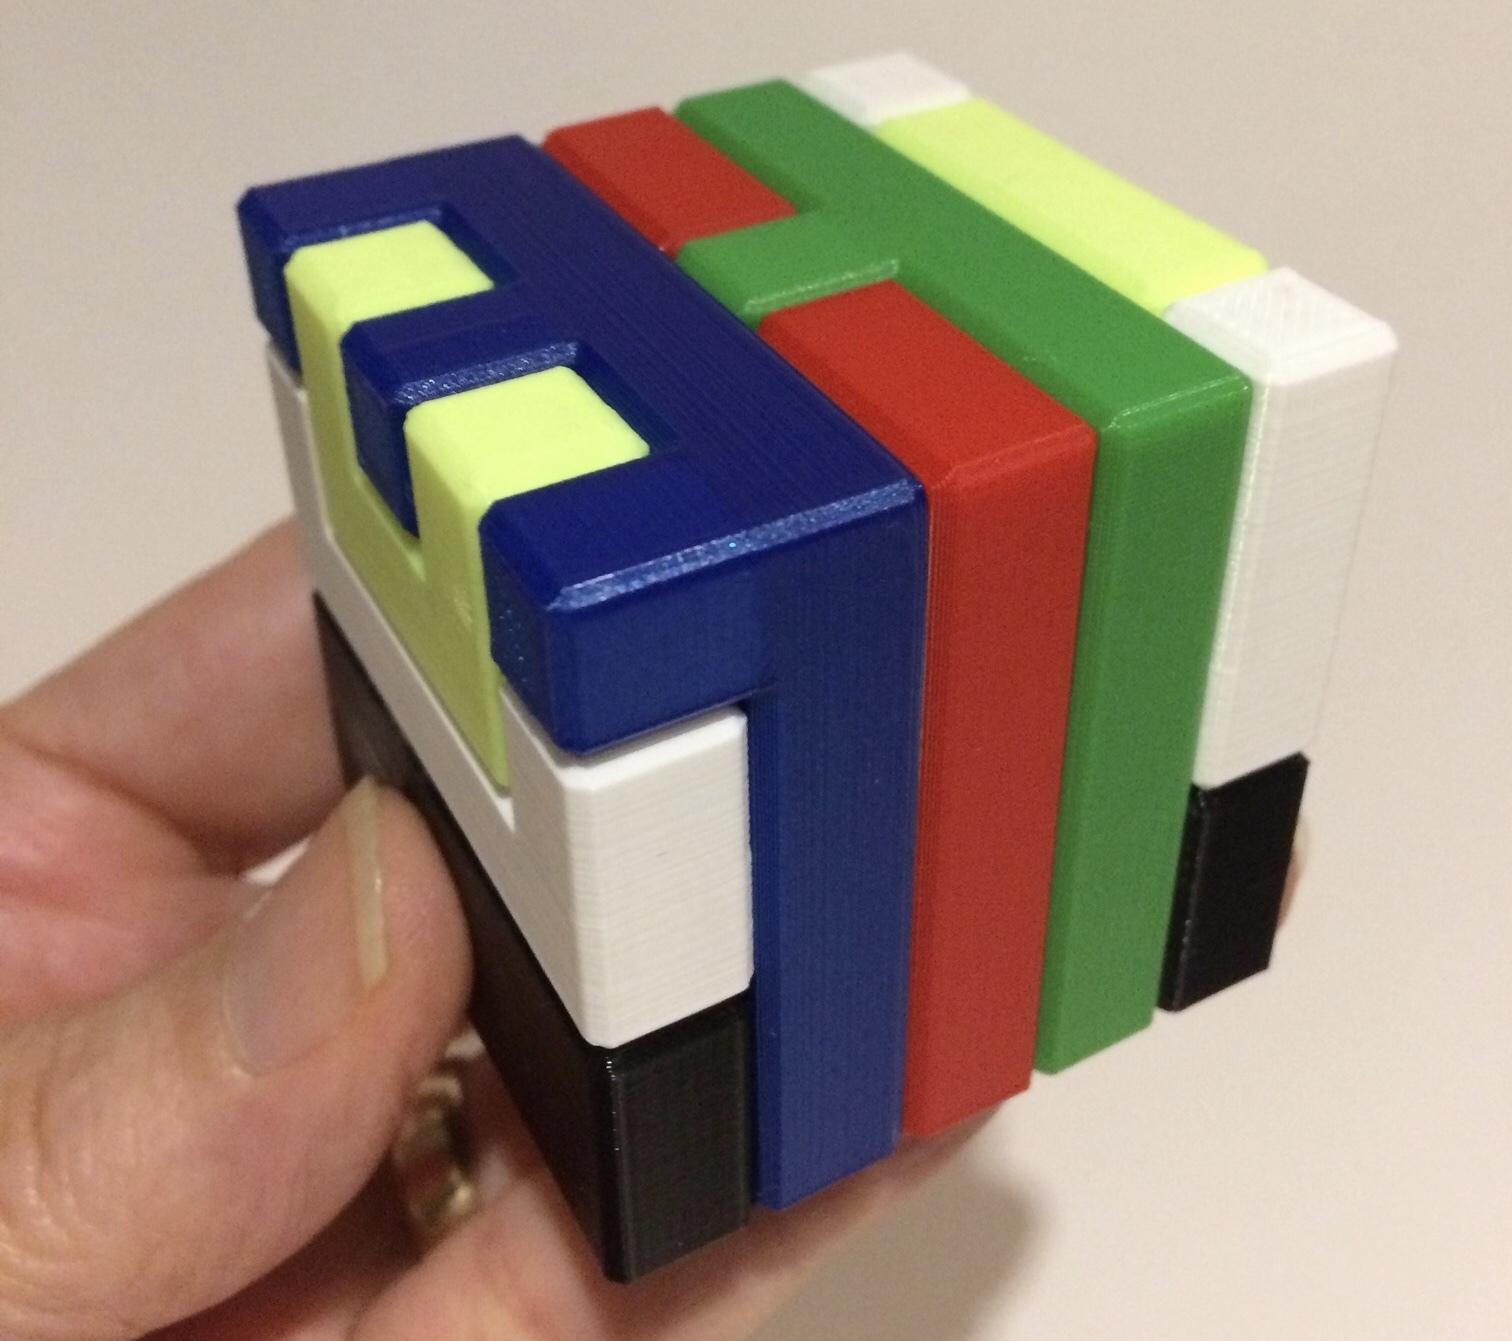 3D Printed Printable Interlocking Puzzle #4 - Level 11Richgain - Printable Burr Puzzle